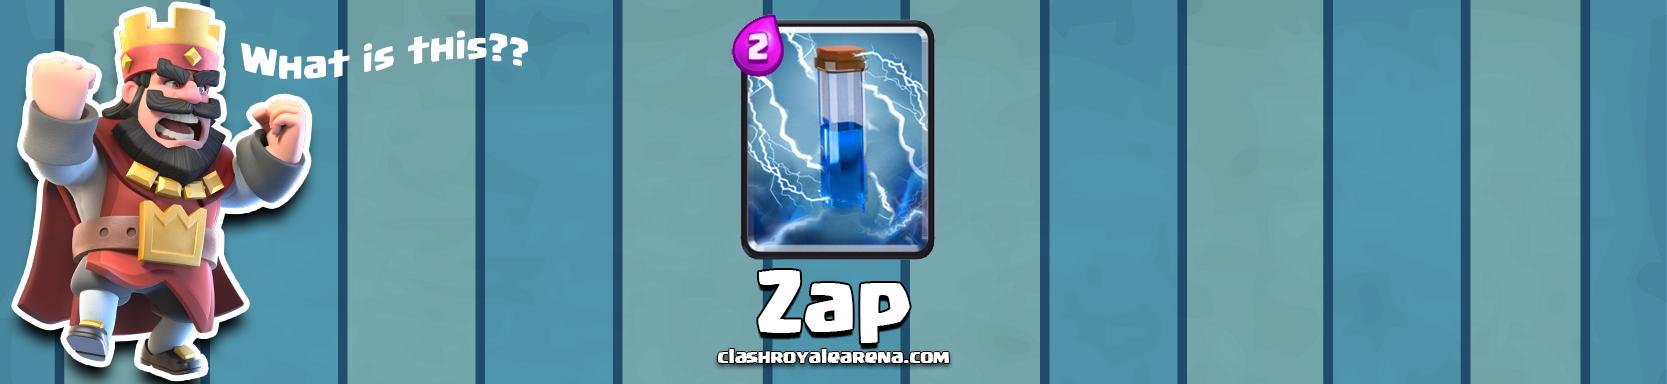 Zap in Clash Royale